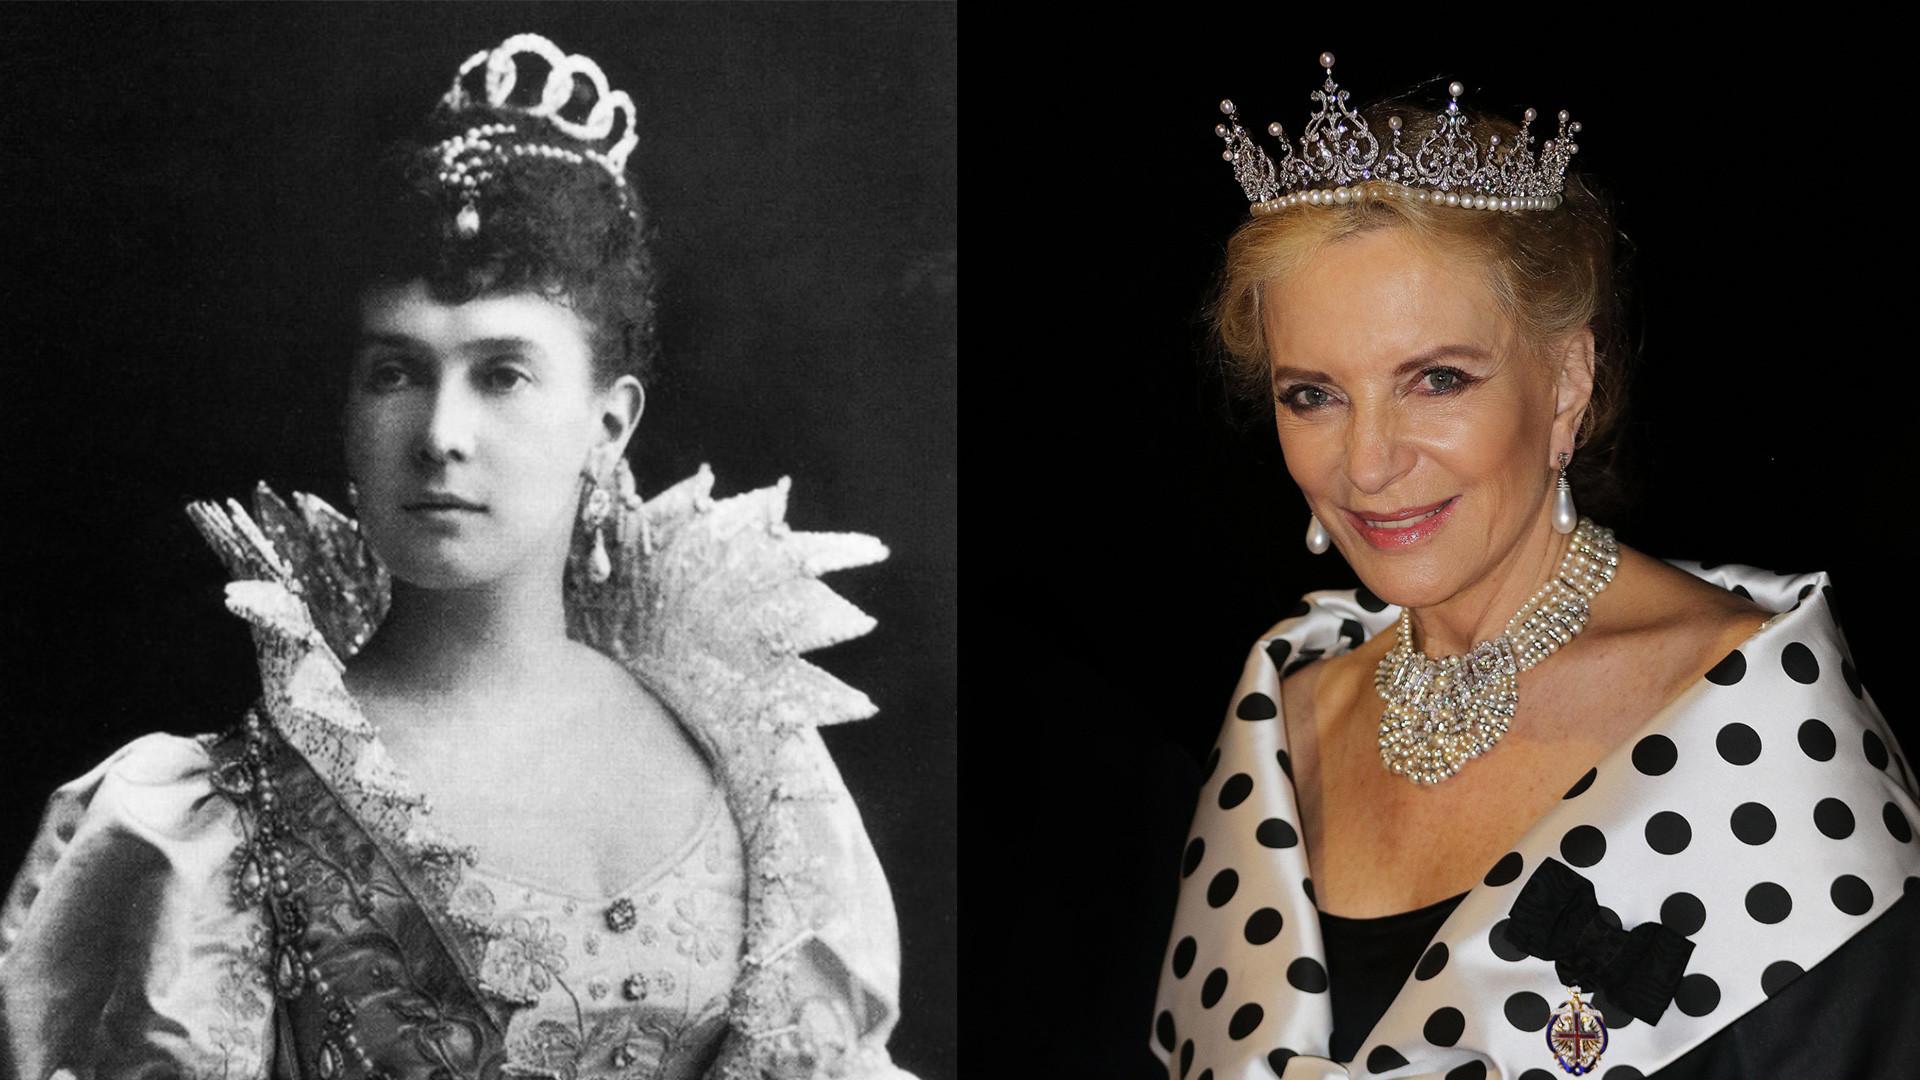 Left: Grand Duchess Maria Pavlovna. Right: Princess Michael of Kent.